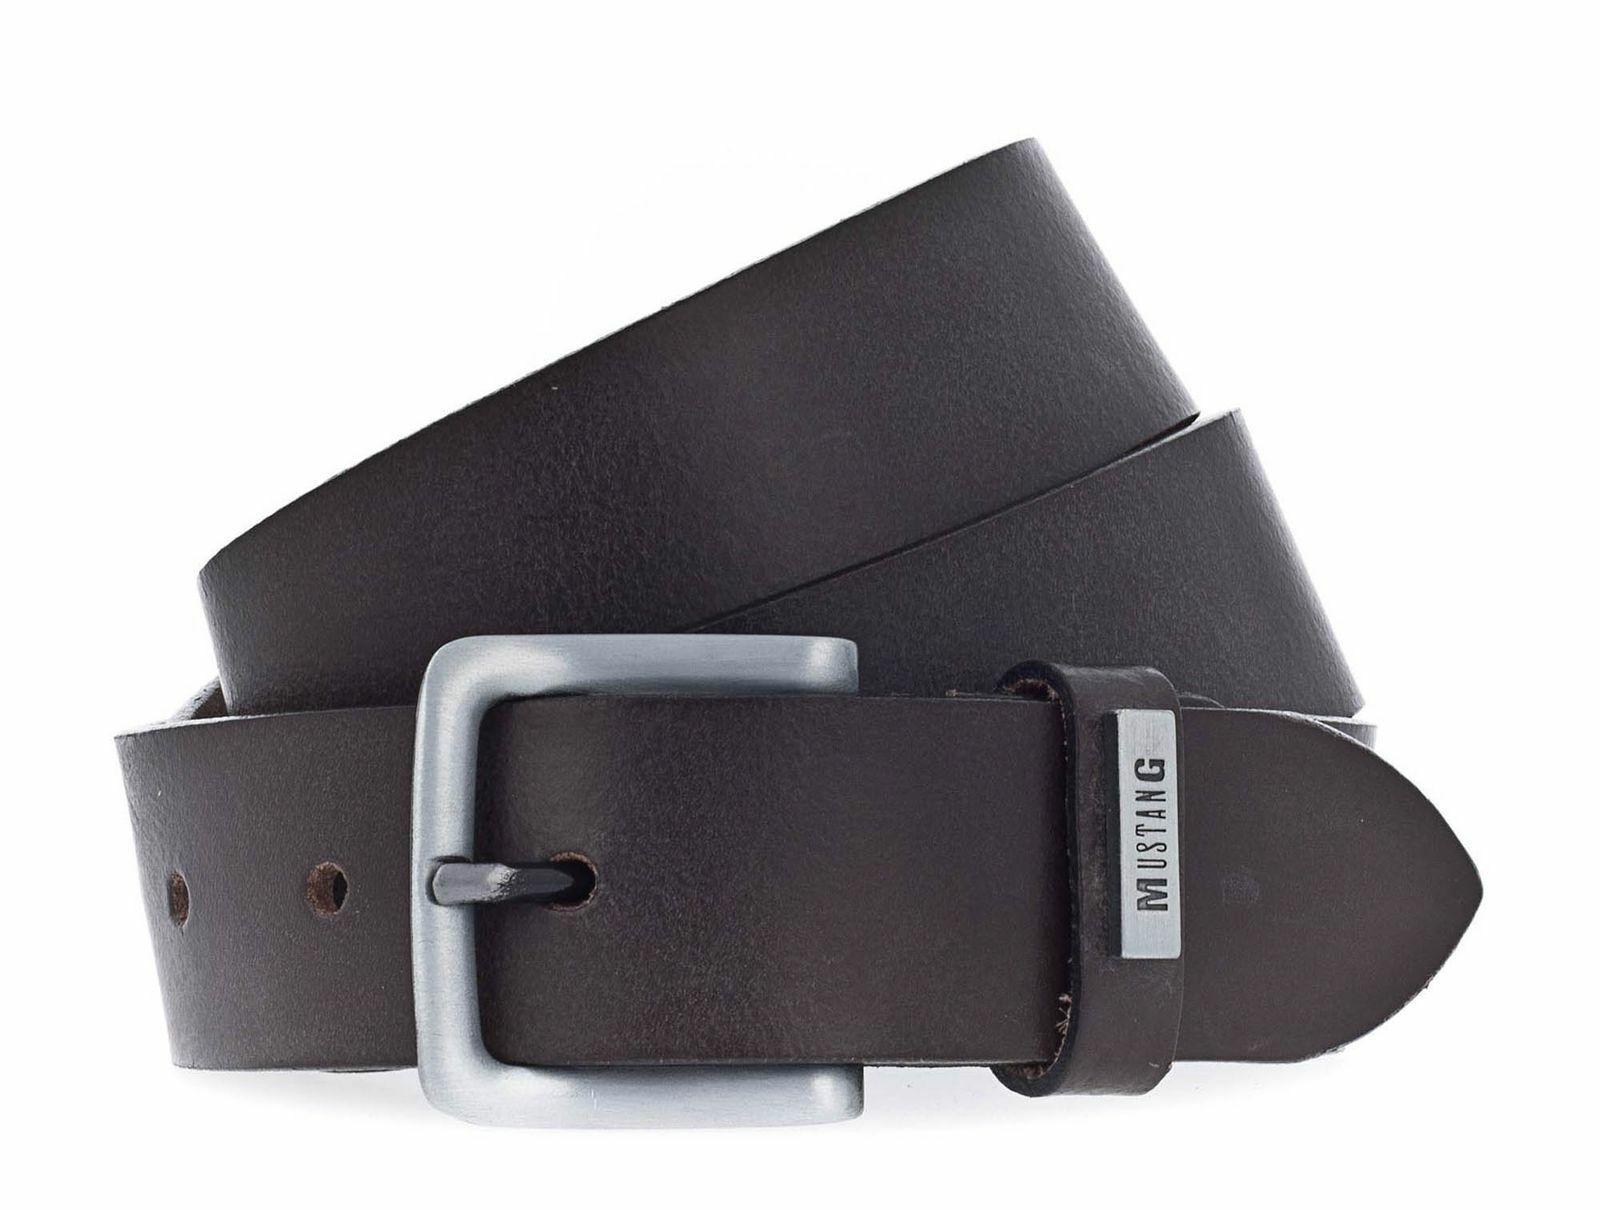 MUSTANG Adjustable Leather Belt 3.5 W105 Gürtel Accessoire Dark Brown Braun Neu